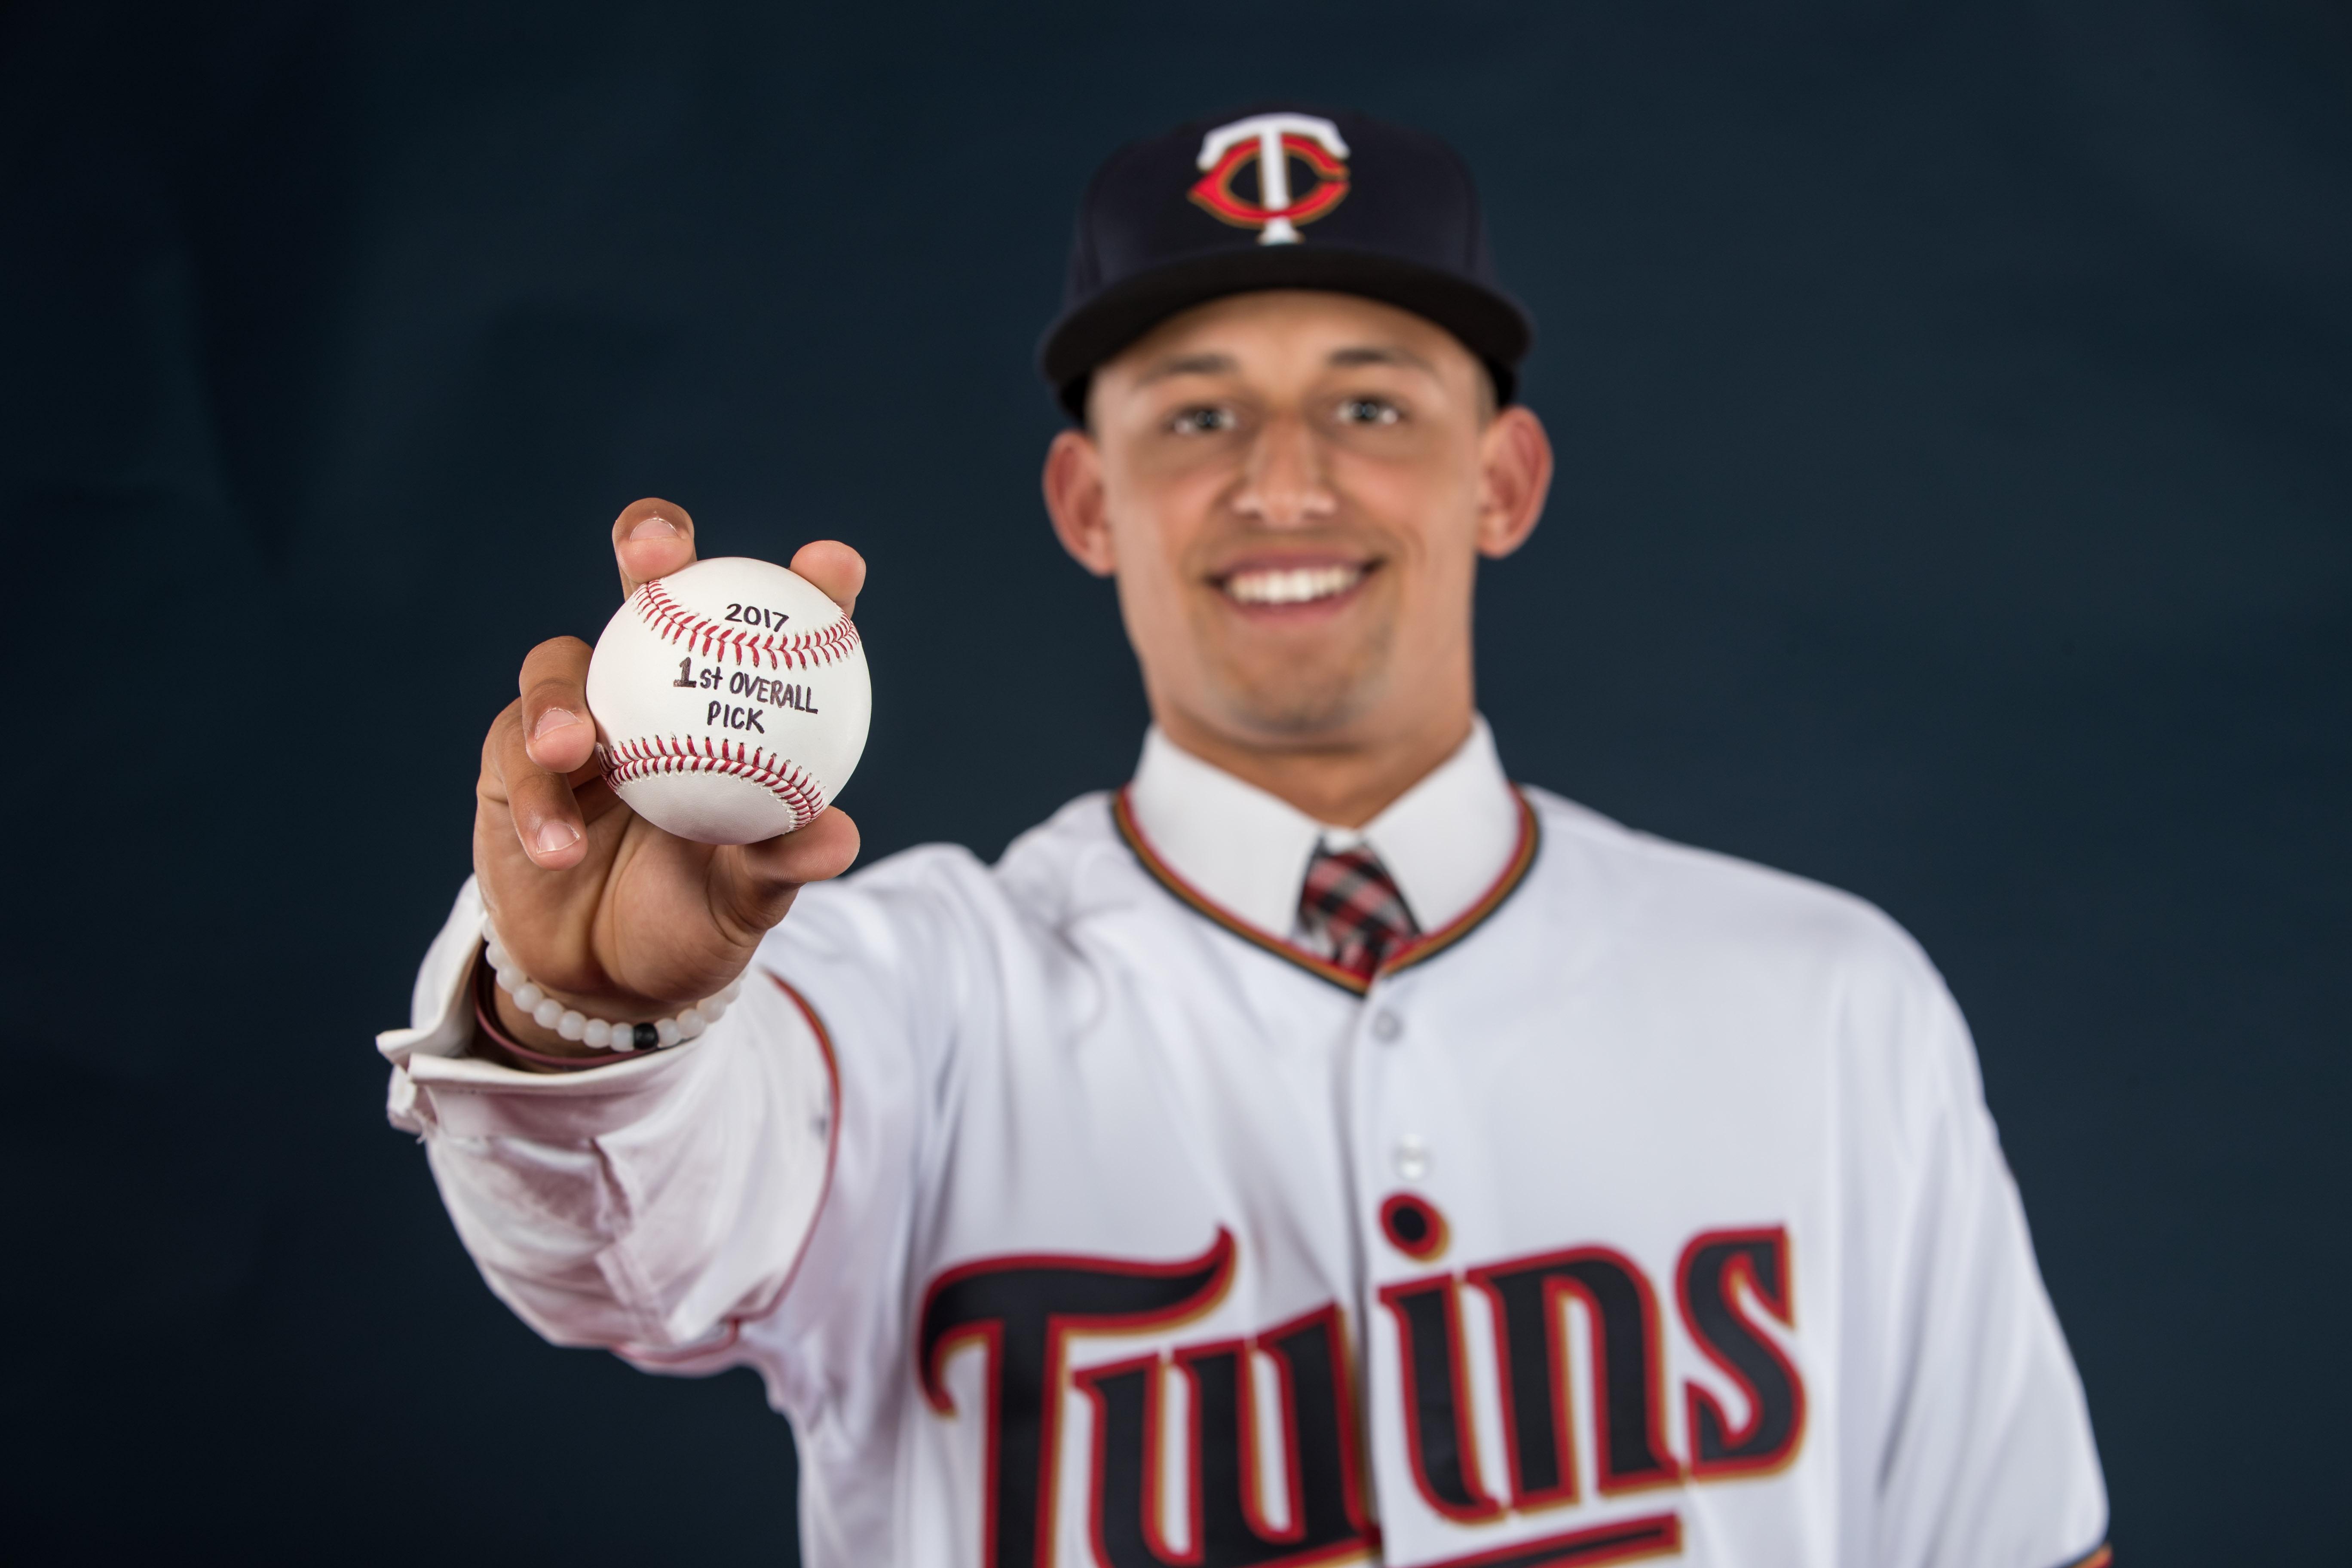 Royce Lewis was taken No. 1 overall in the 2017 MLB Draft. Photo: Brace Hammelgarn/Minnesota  Twins